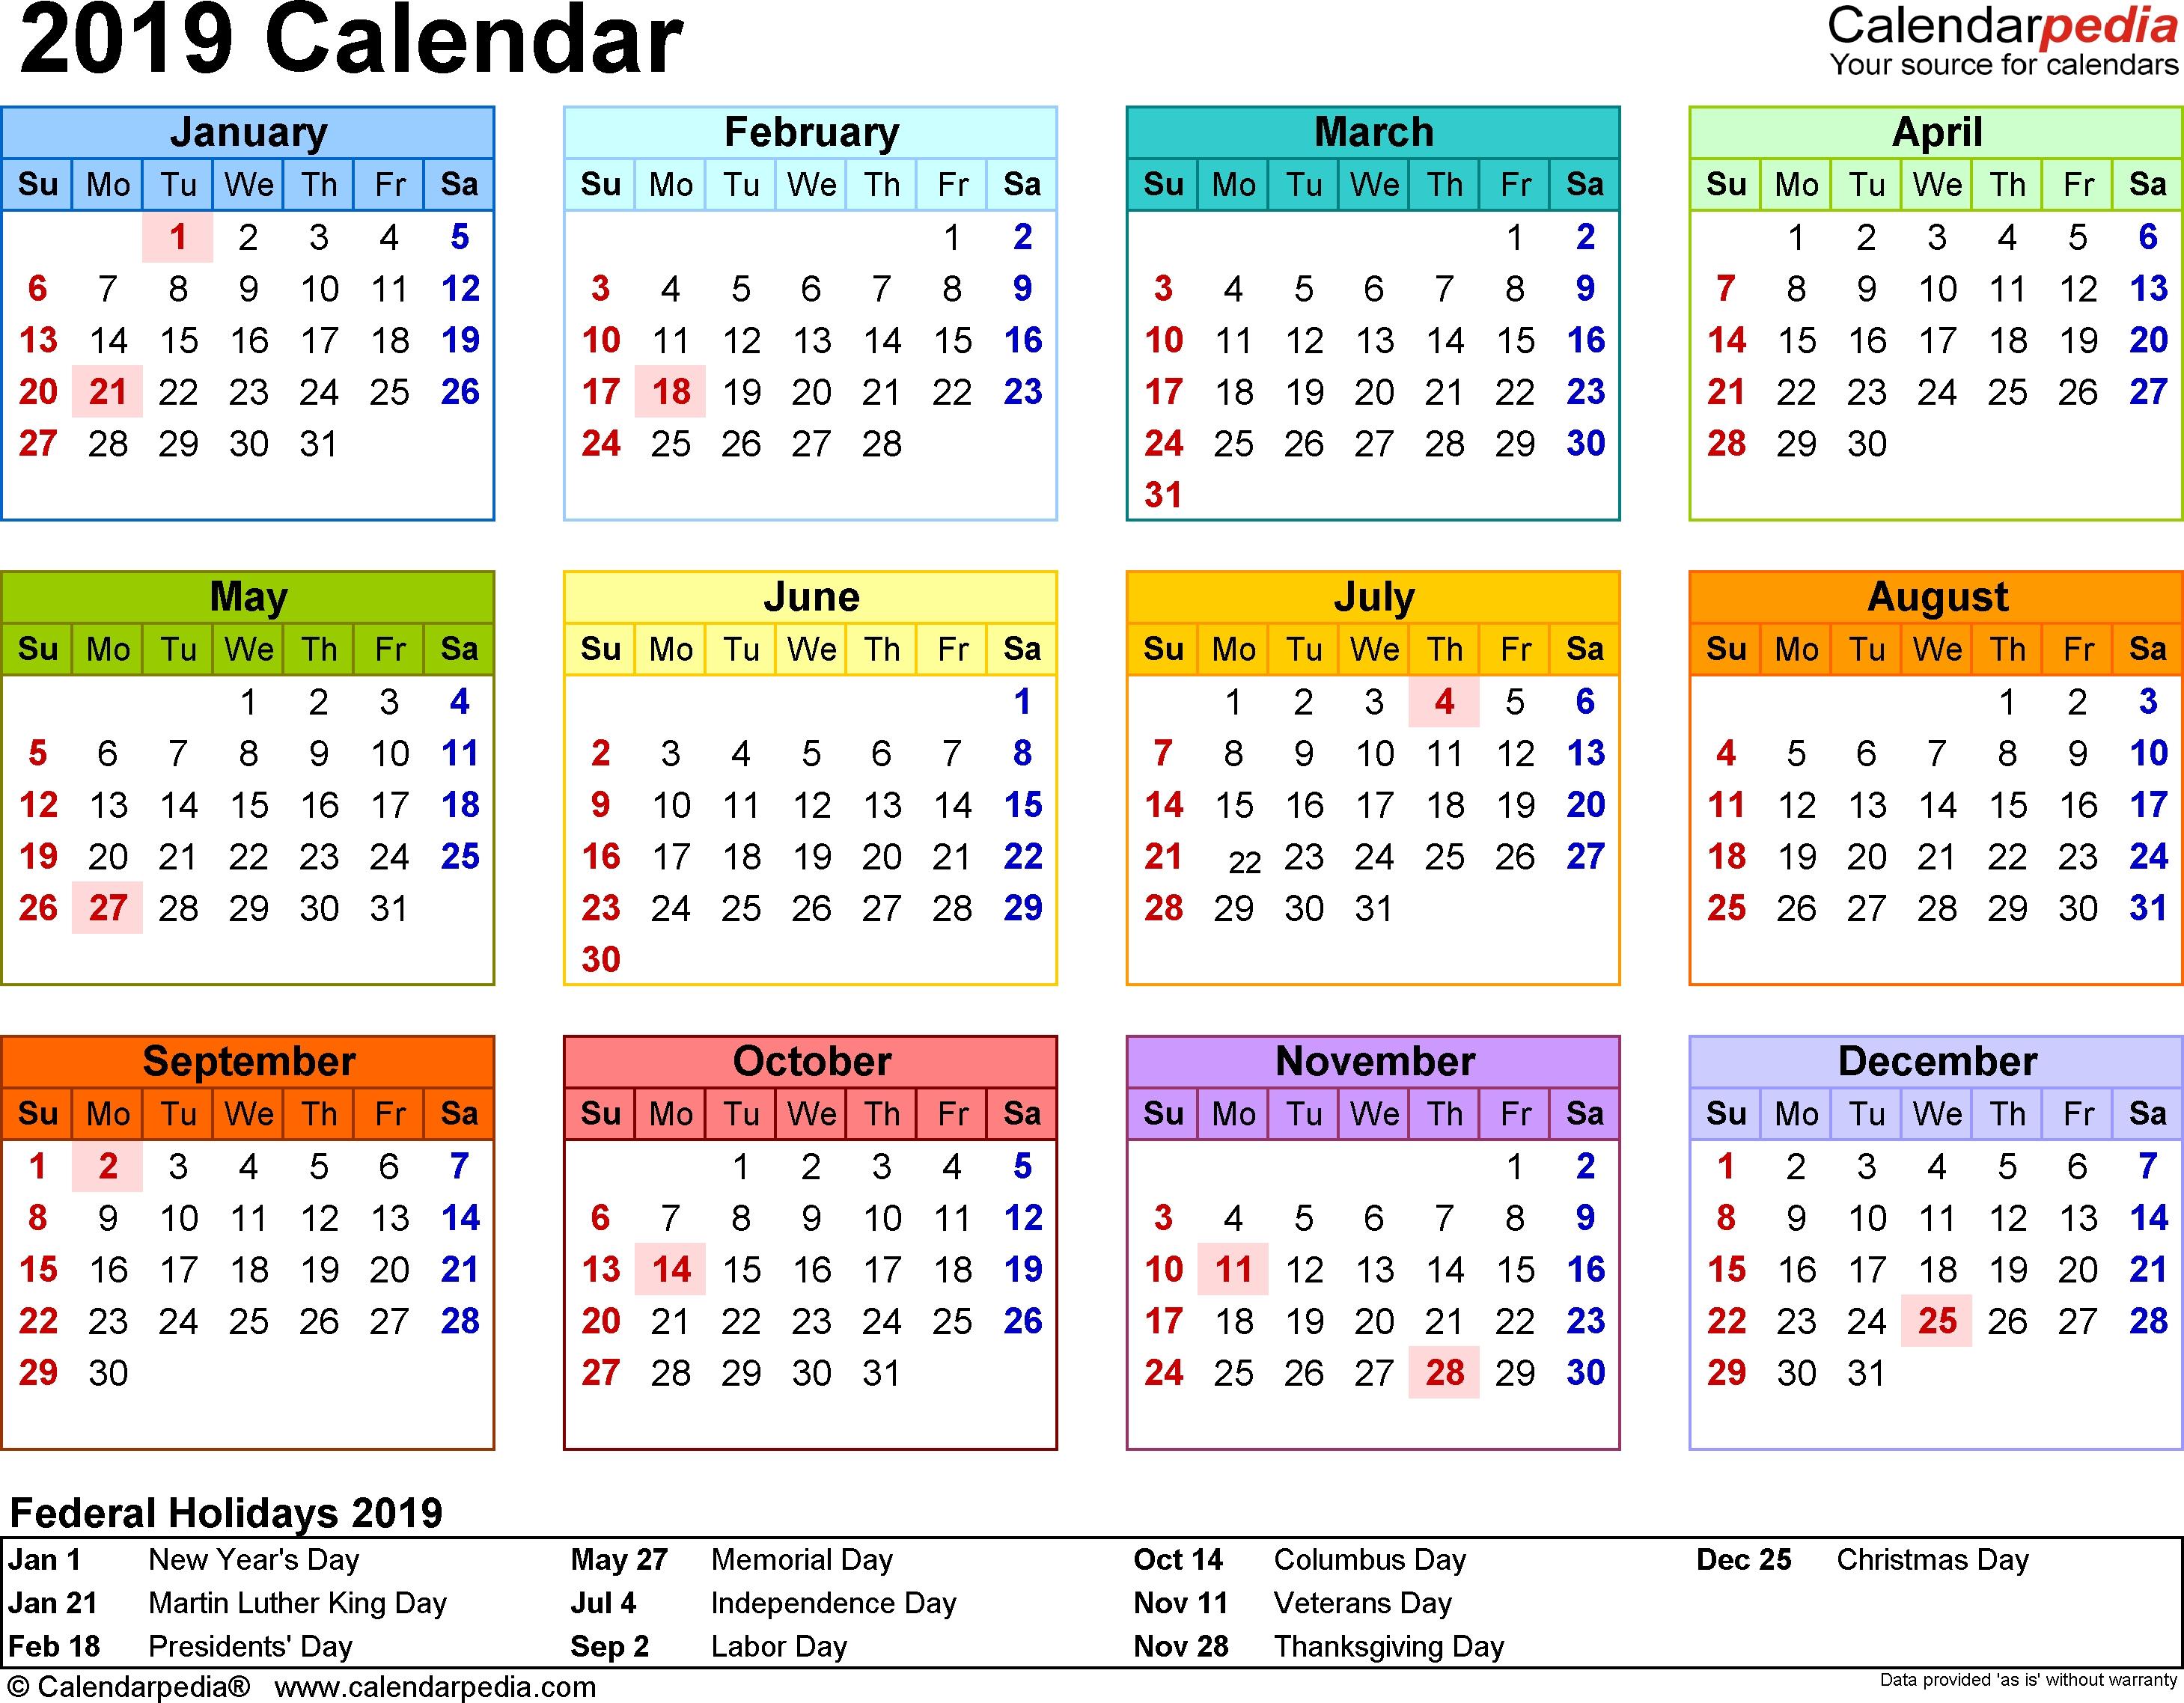 2019 Calendar Pdf - 17 Free Printable Calendar Templates regarding Year At A Glance Printable Calendars